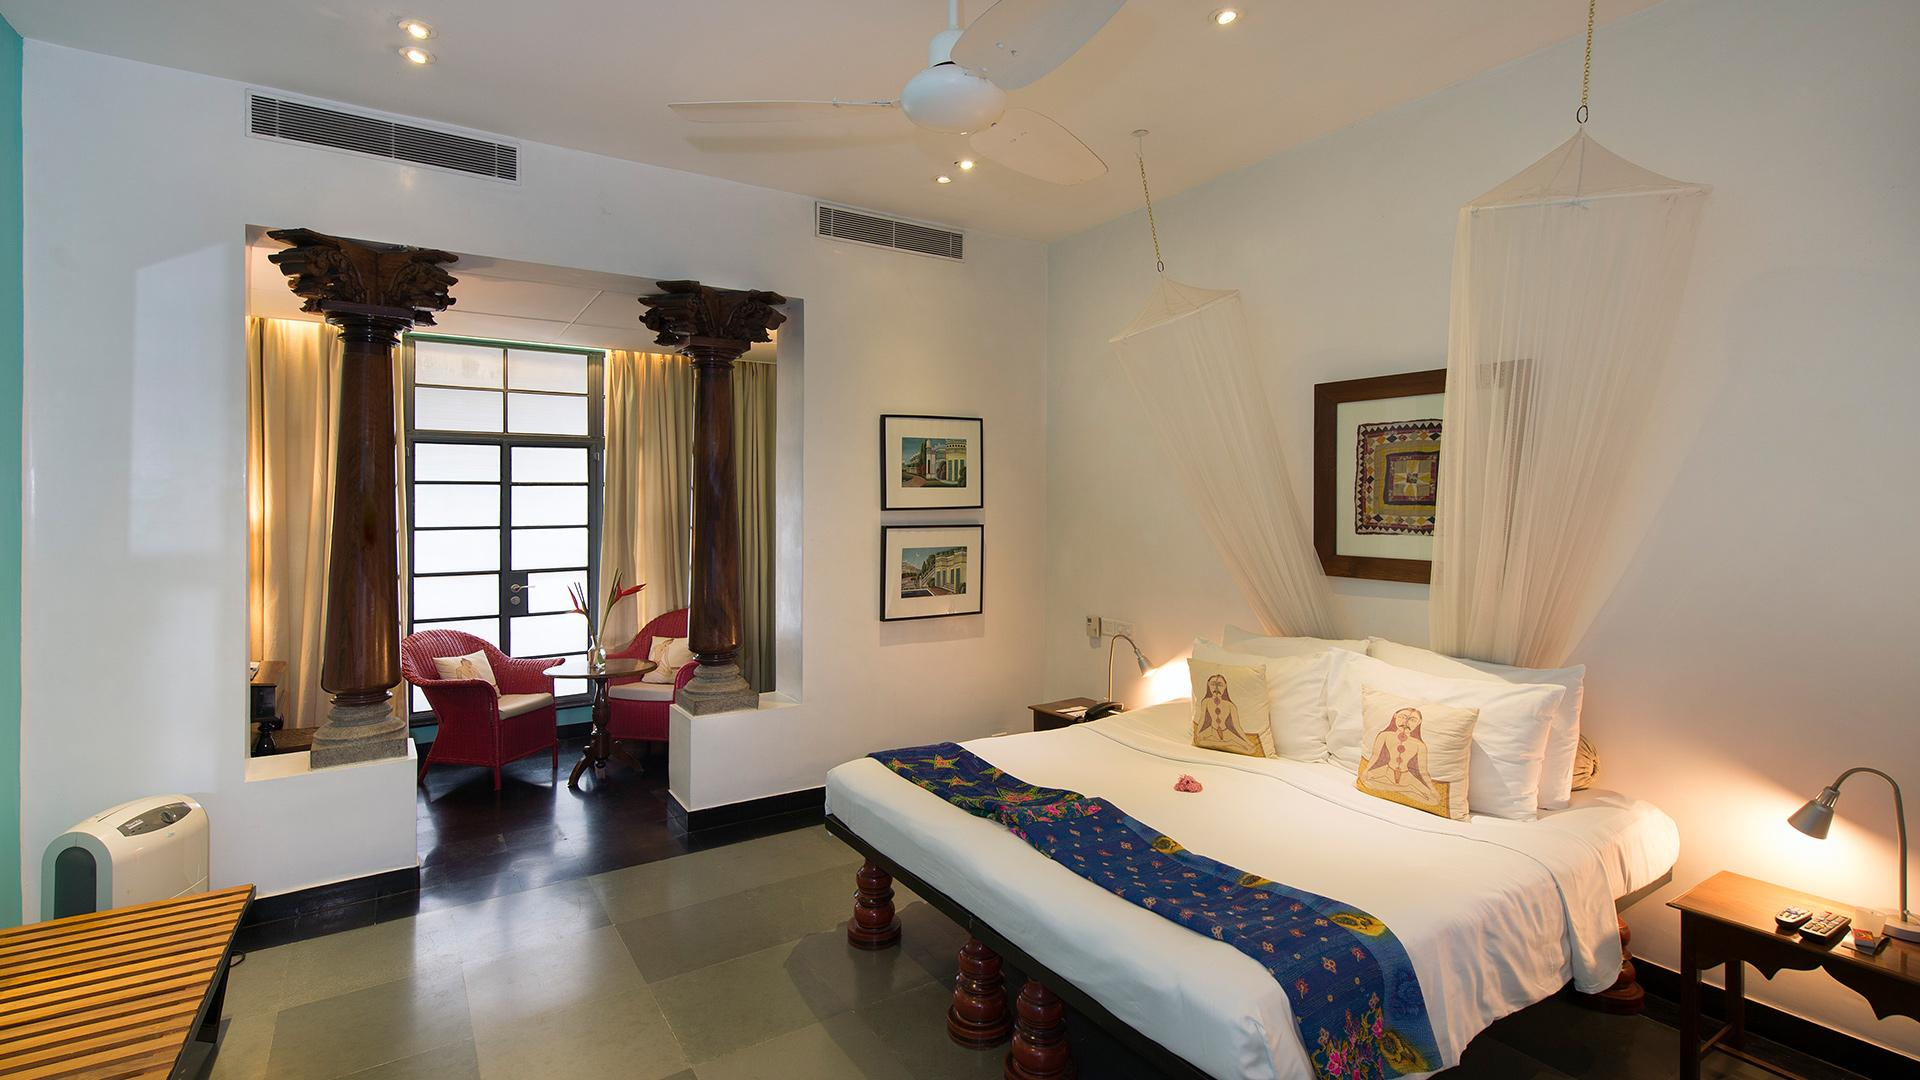 Deluxe Room image 1 at Malabar House by Kerala, Kochi, India